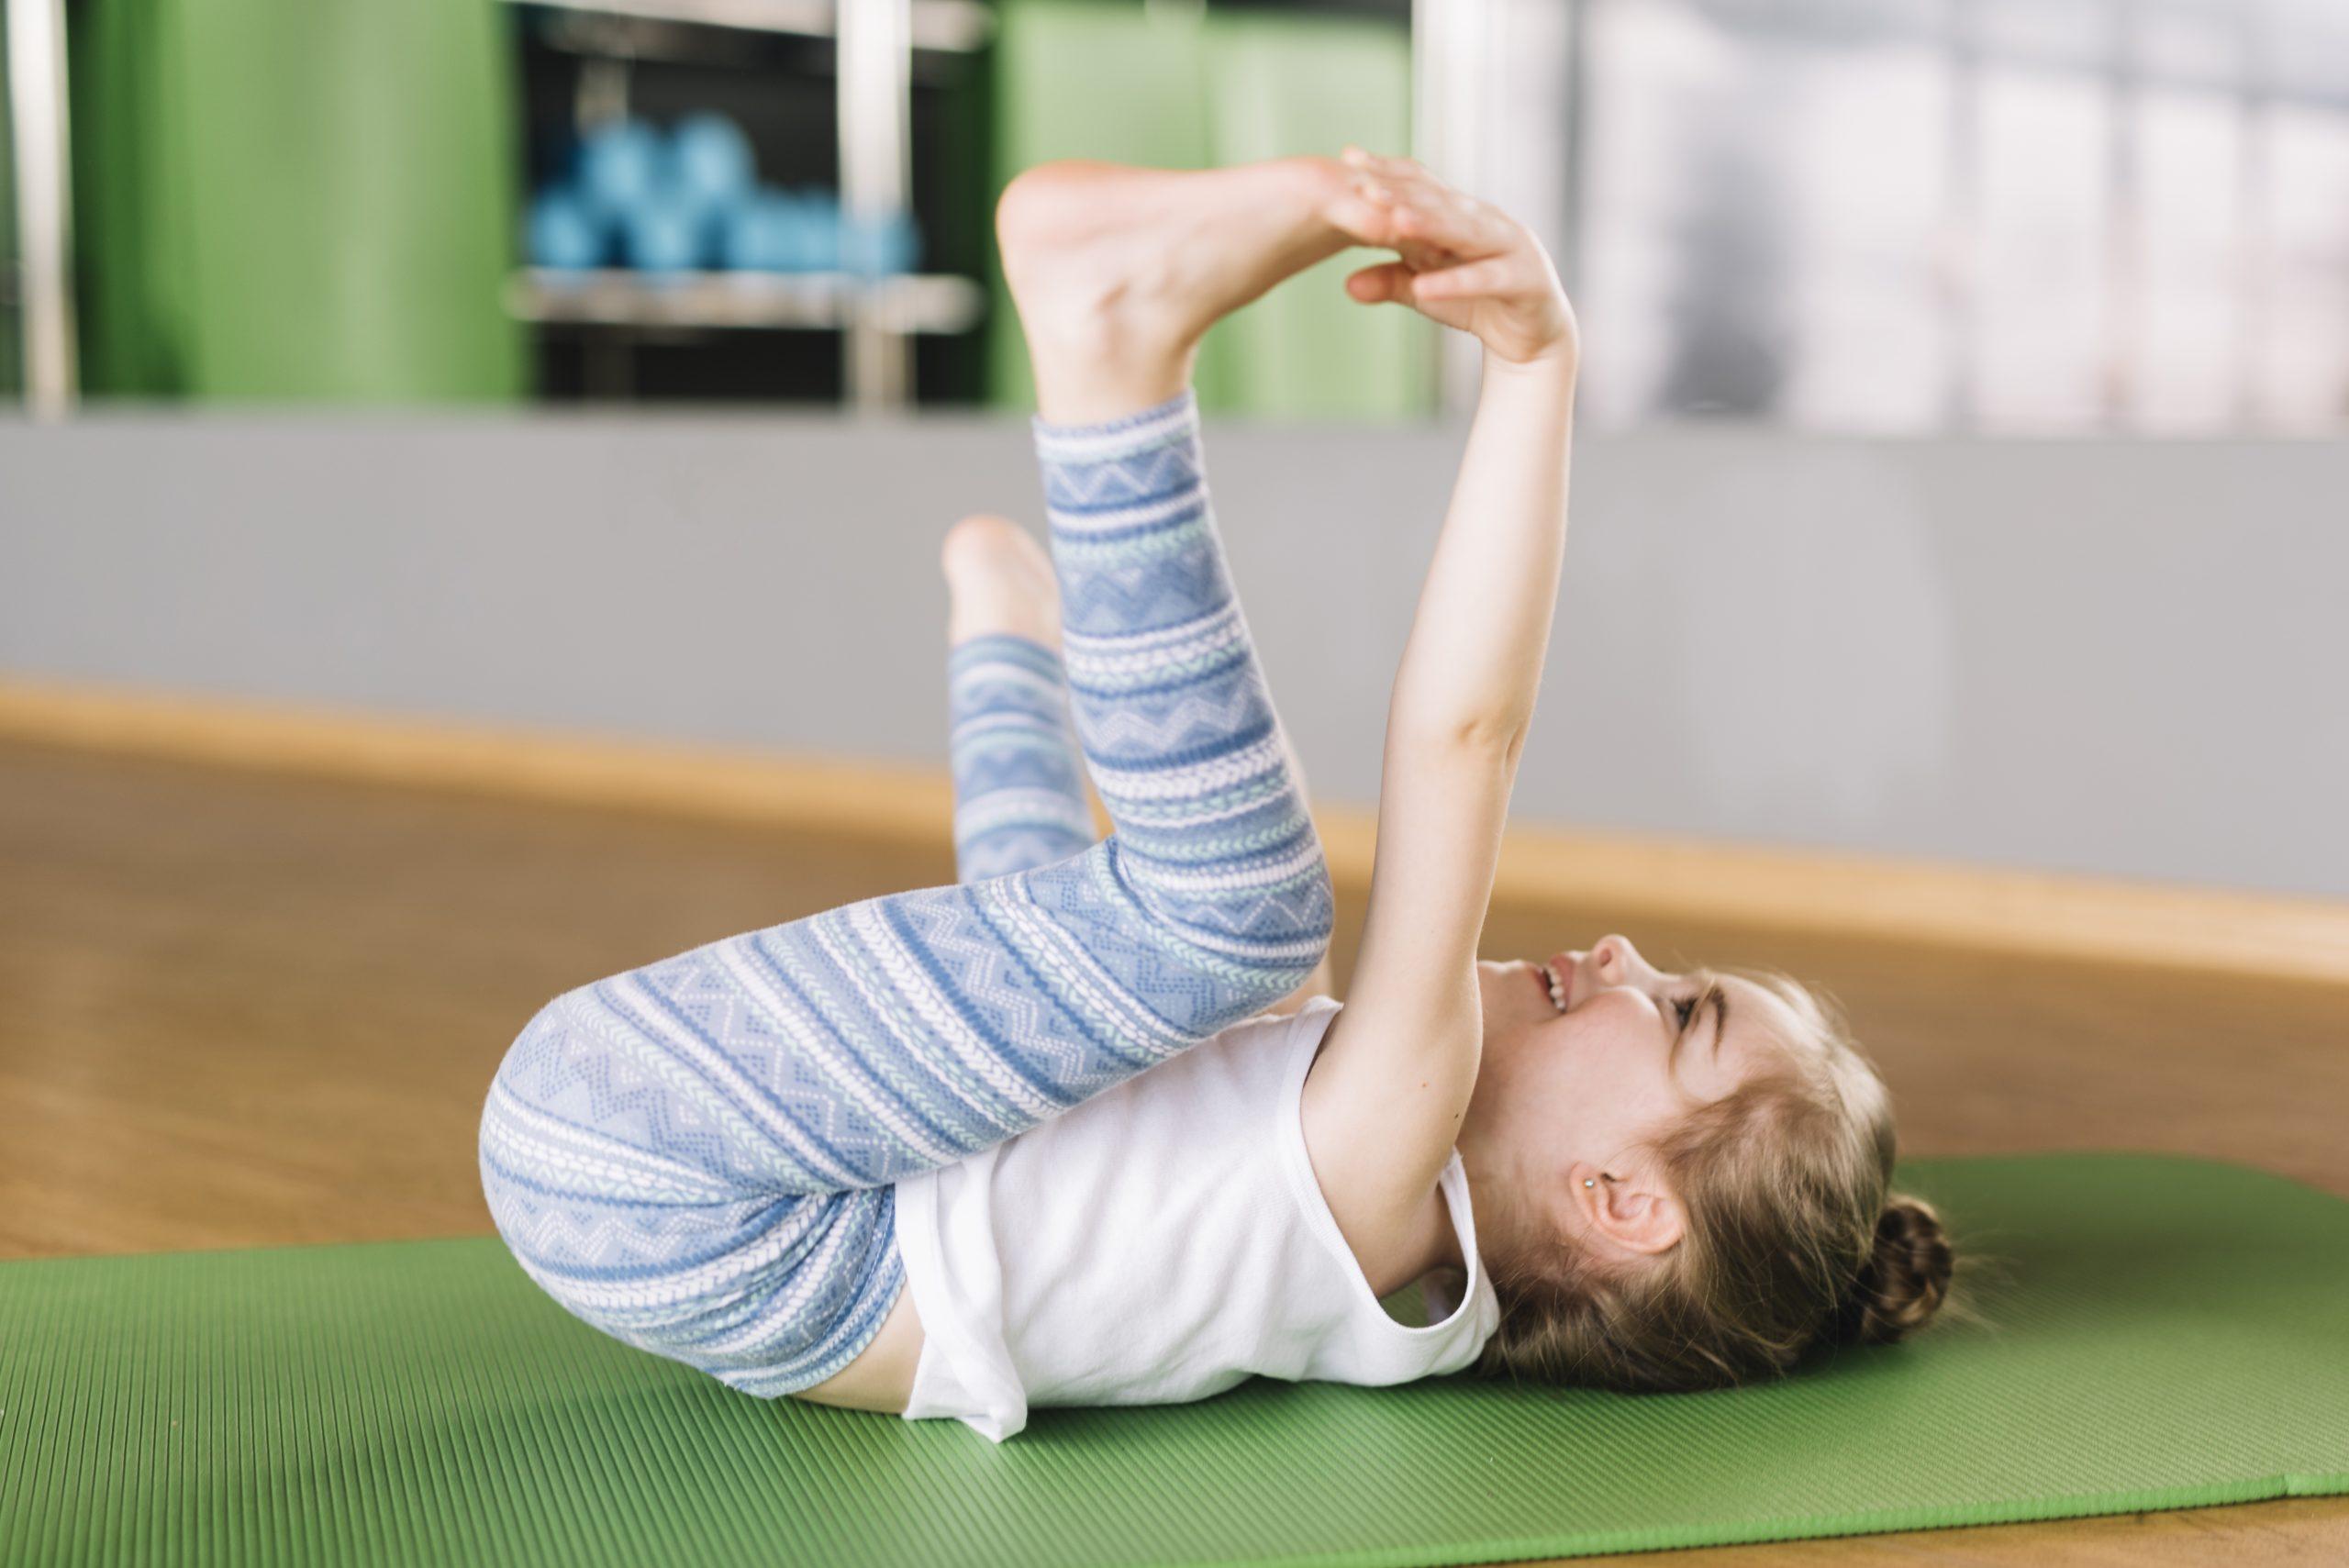 barnyoga i åkersberga, barnyoga i stockholm, barnyoga i täby, barnyoga in english, children yoga in stockholm, vad är barnyoga?, varför barnyoga?, barnyogakurser